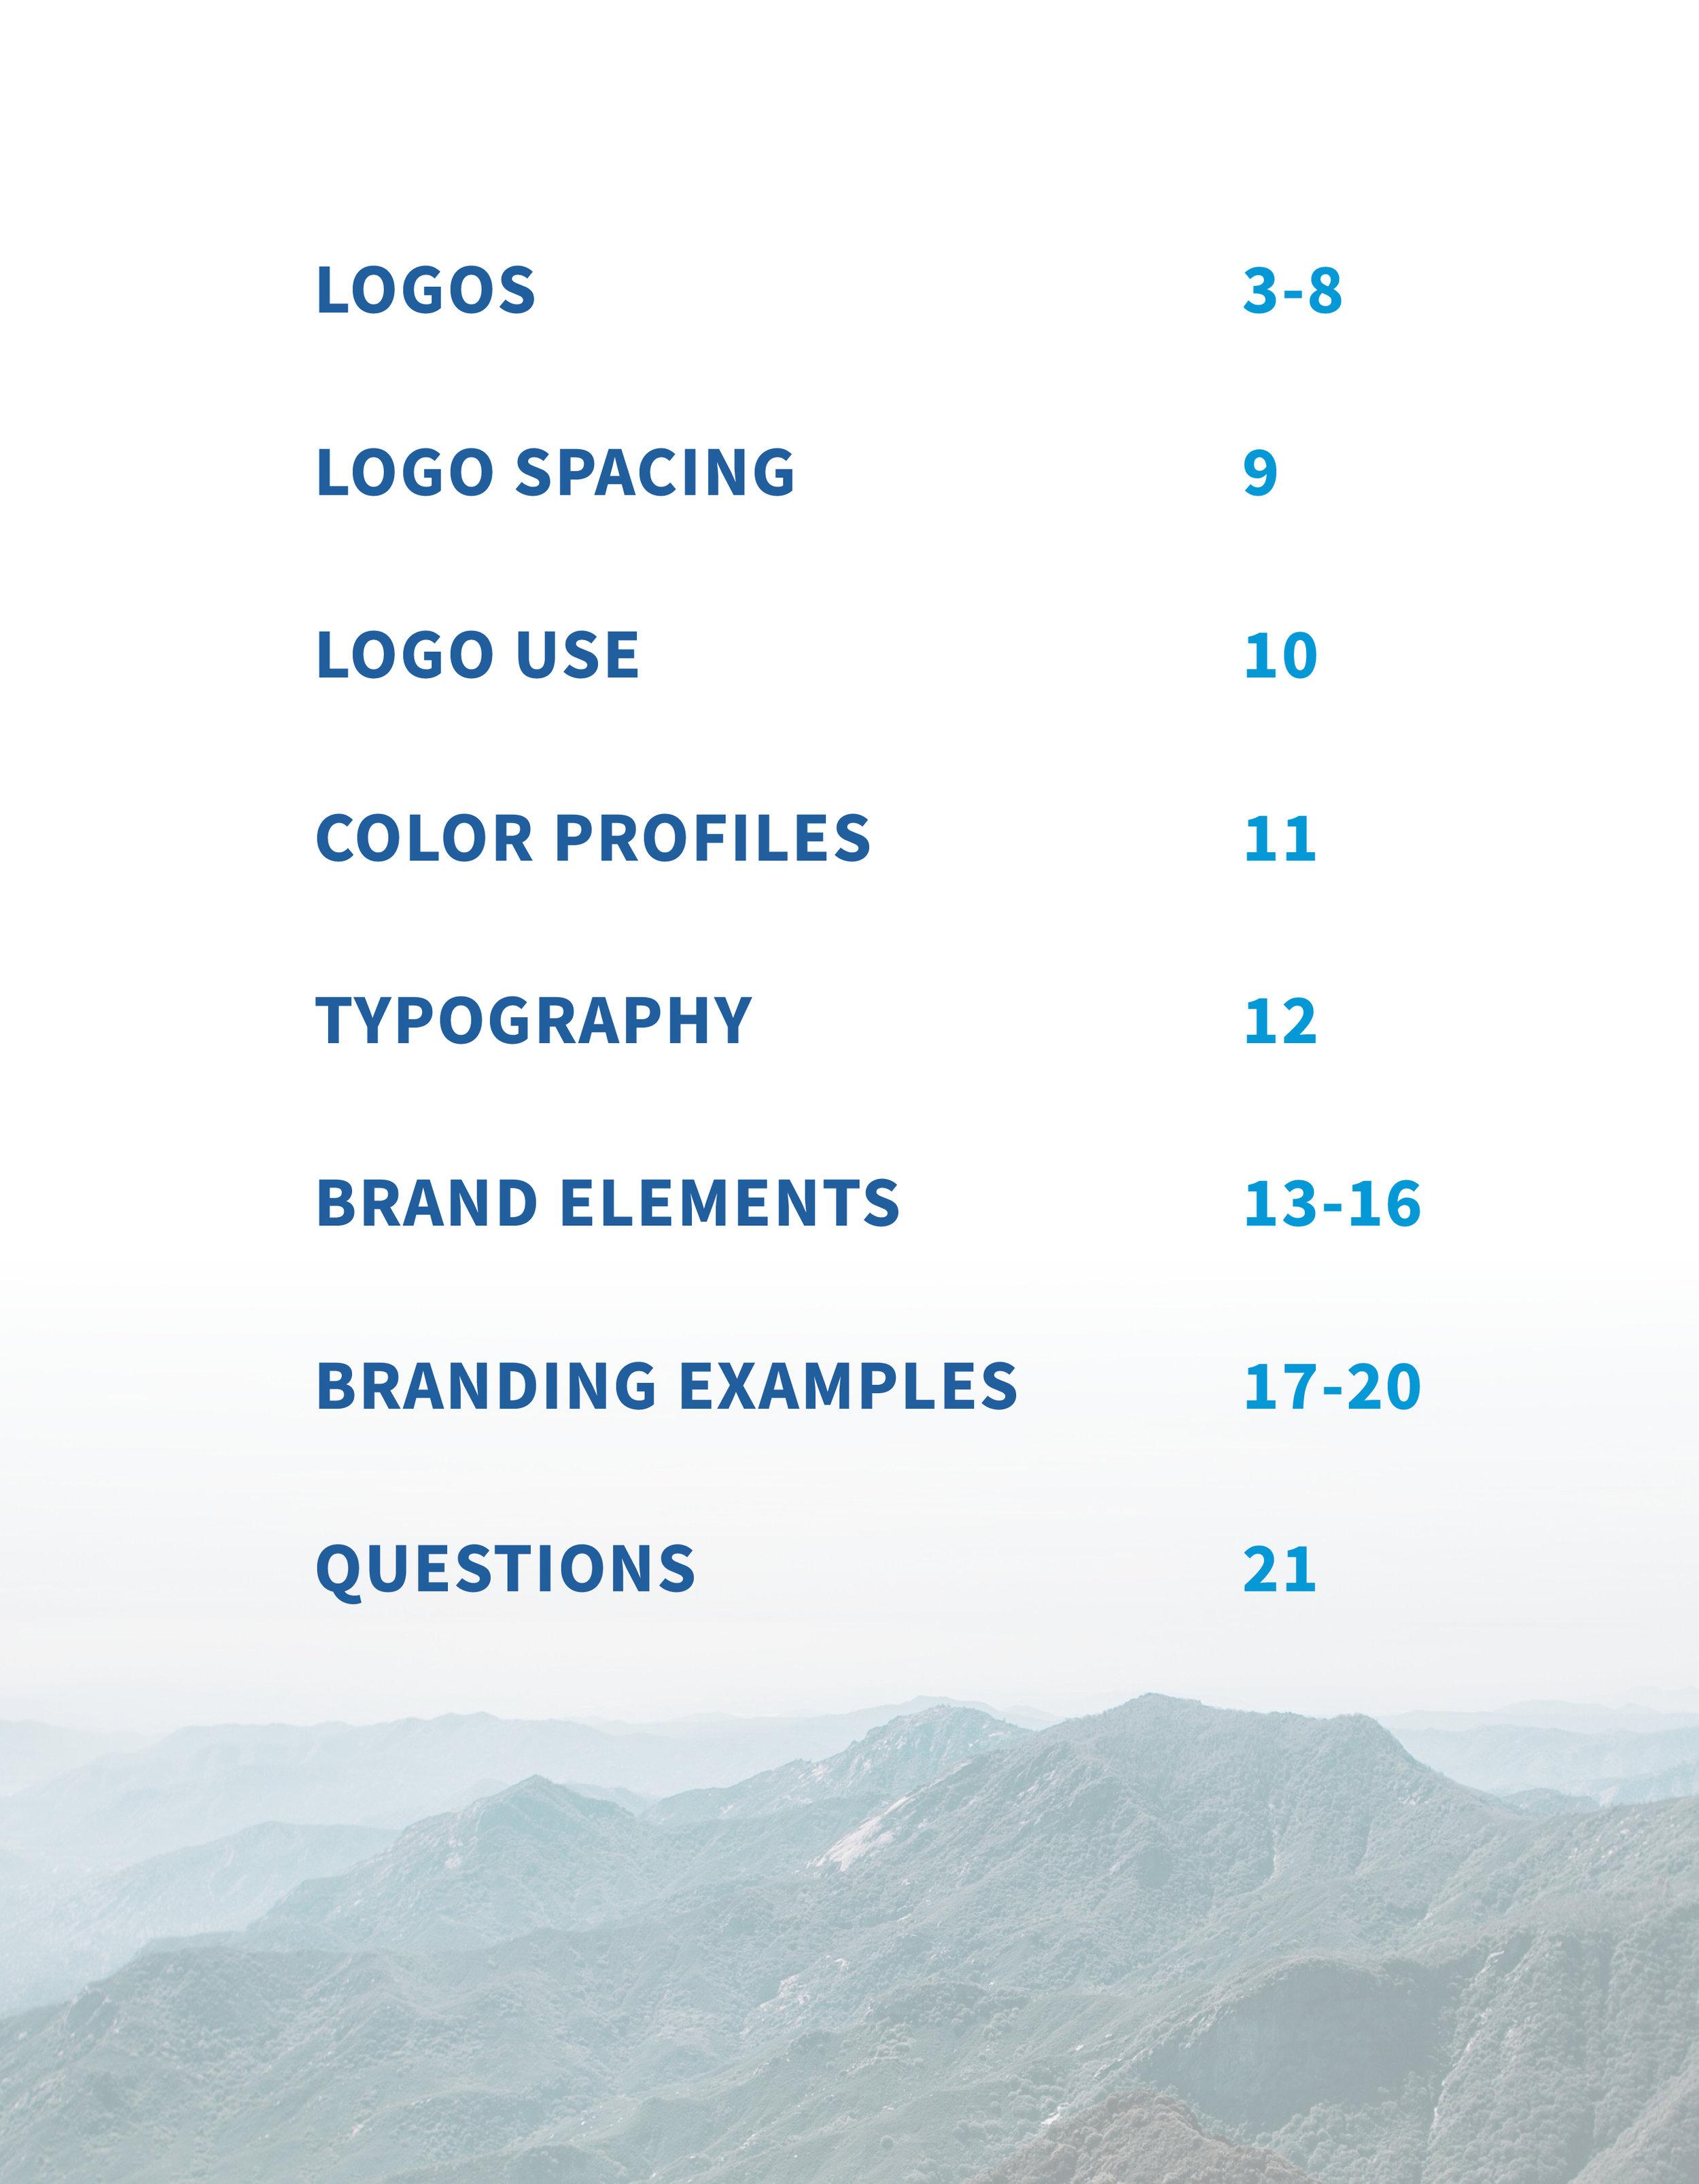 apparel-company-brand-guidelines-design-by-jordan-fretz-design-12.jpg